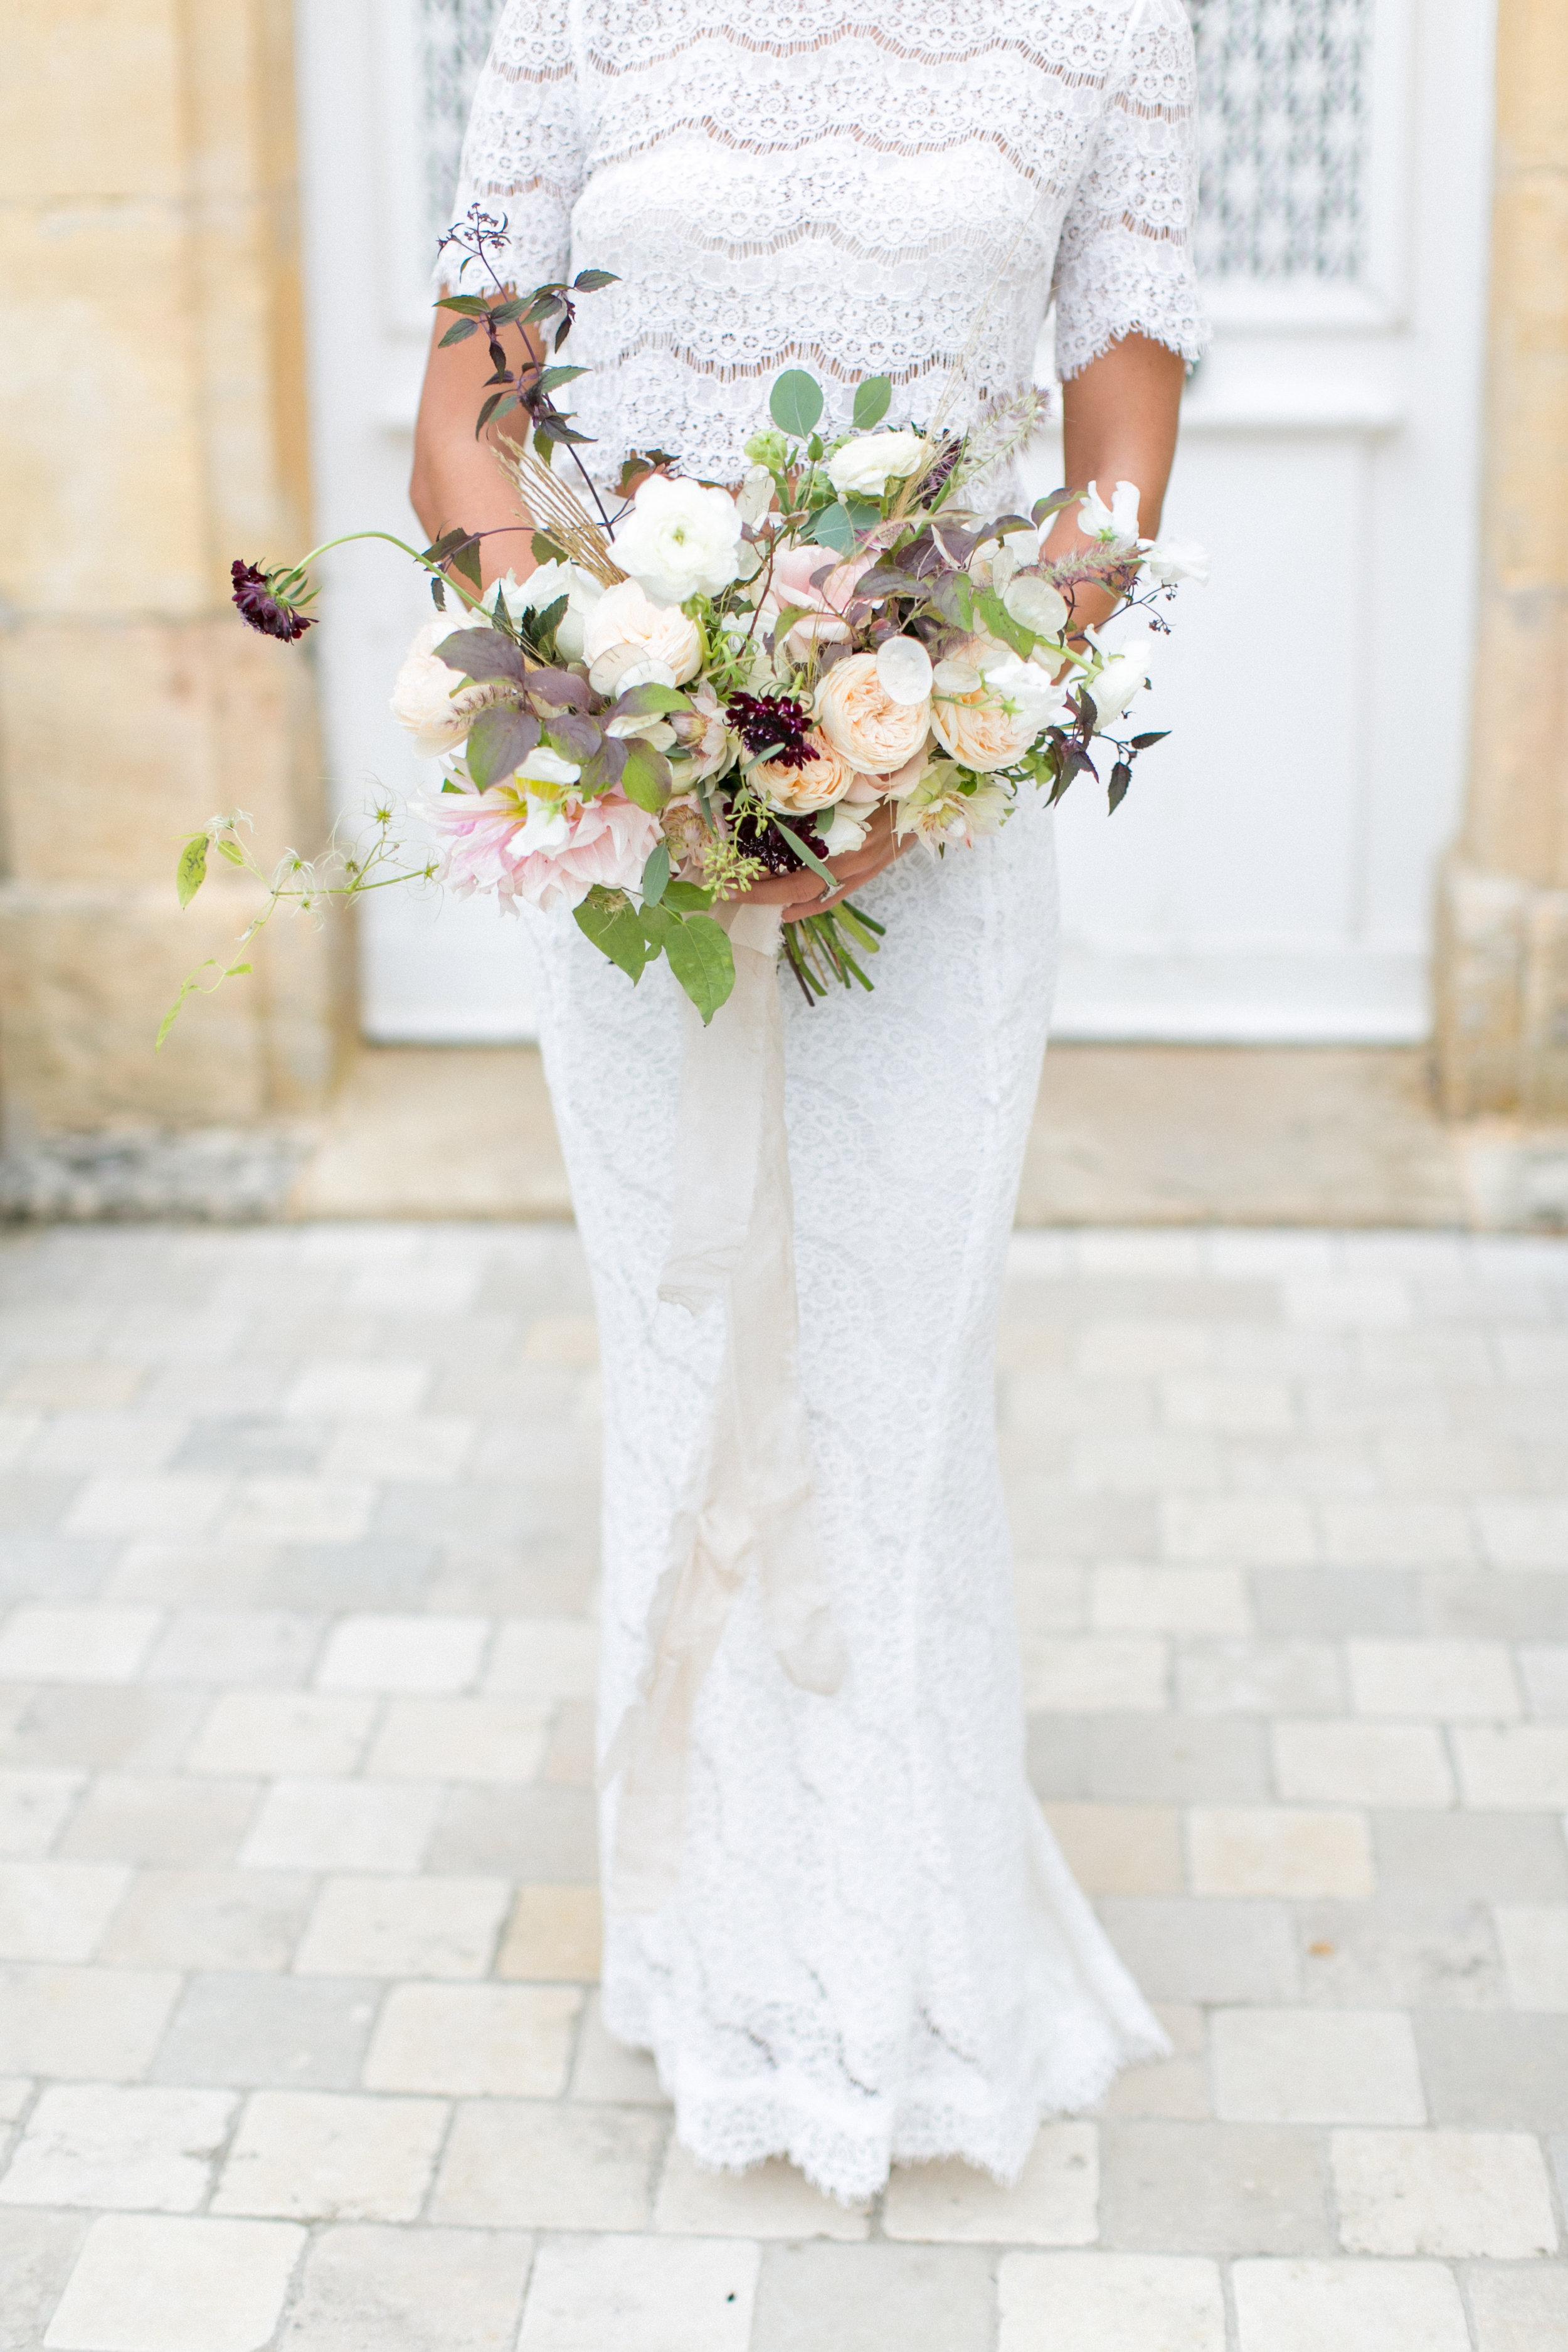 Chateau-de-Redon-Wedding-Anneli-Marinovich-Photography-105.jpg